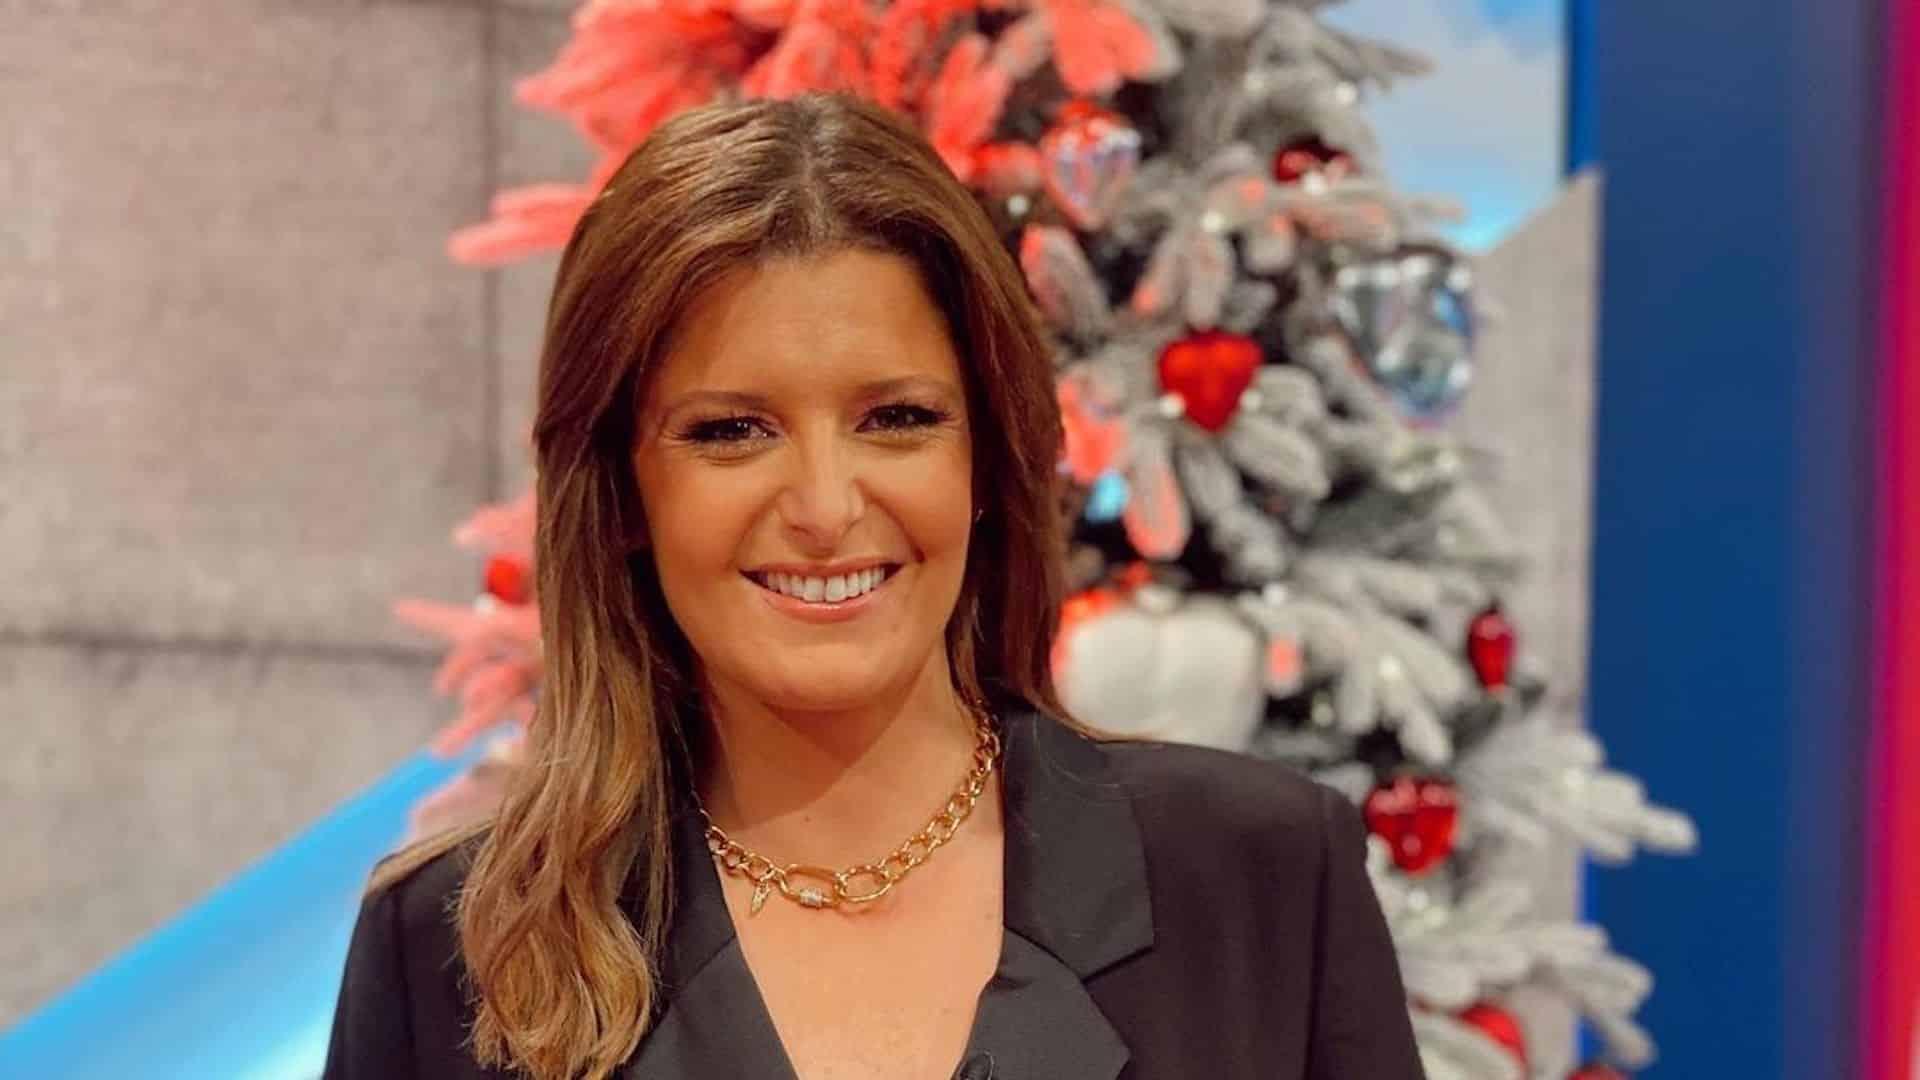 Maria Botelho Moniz, Extra Big Brother